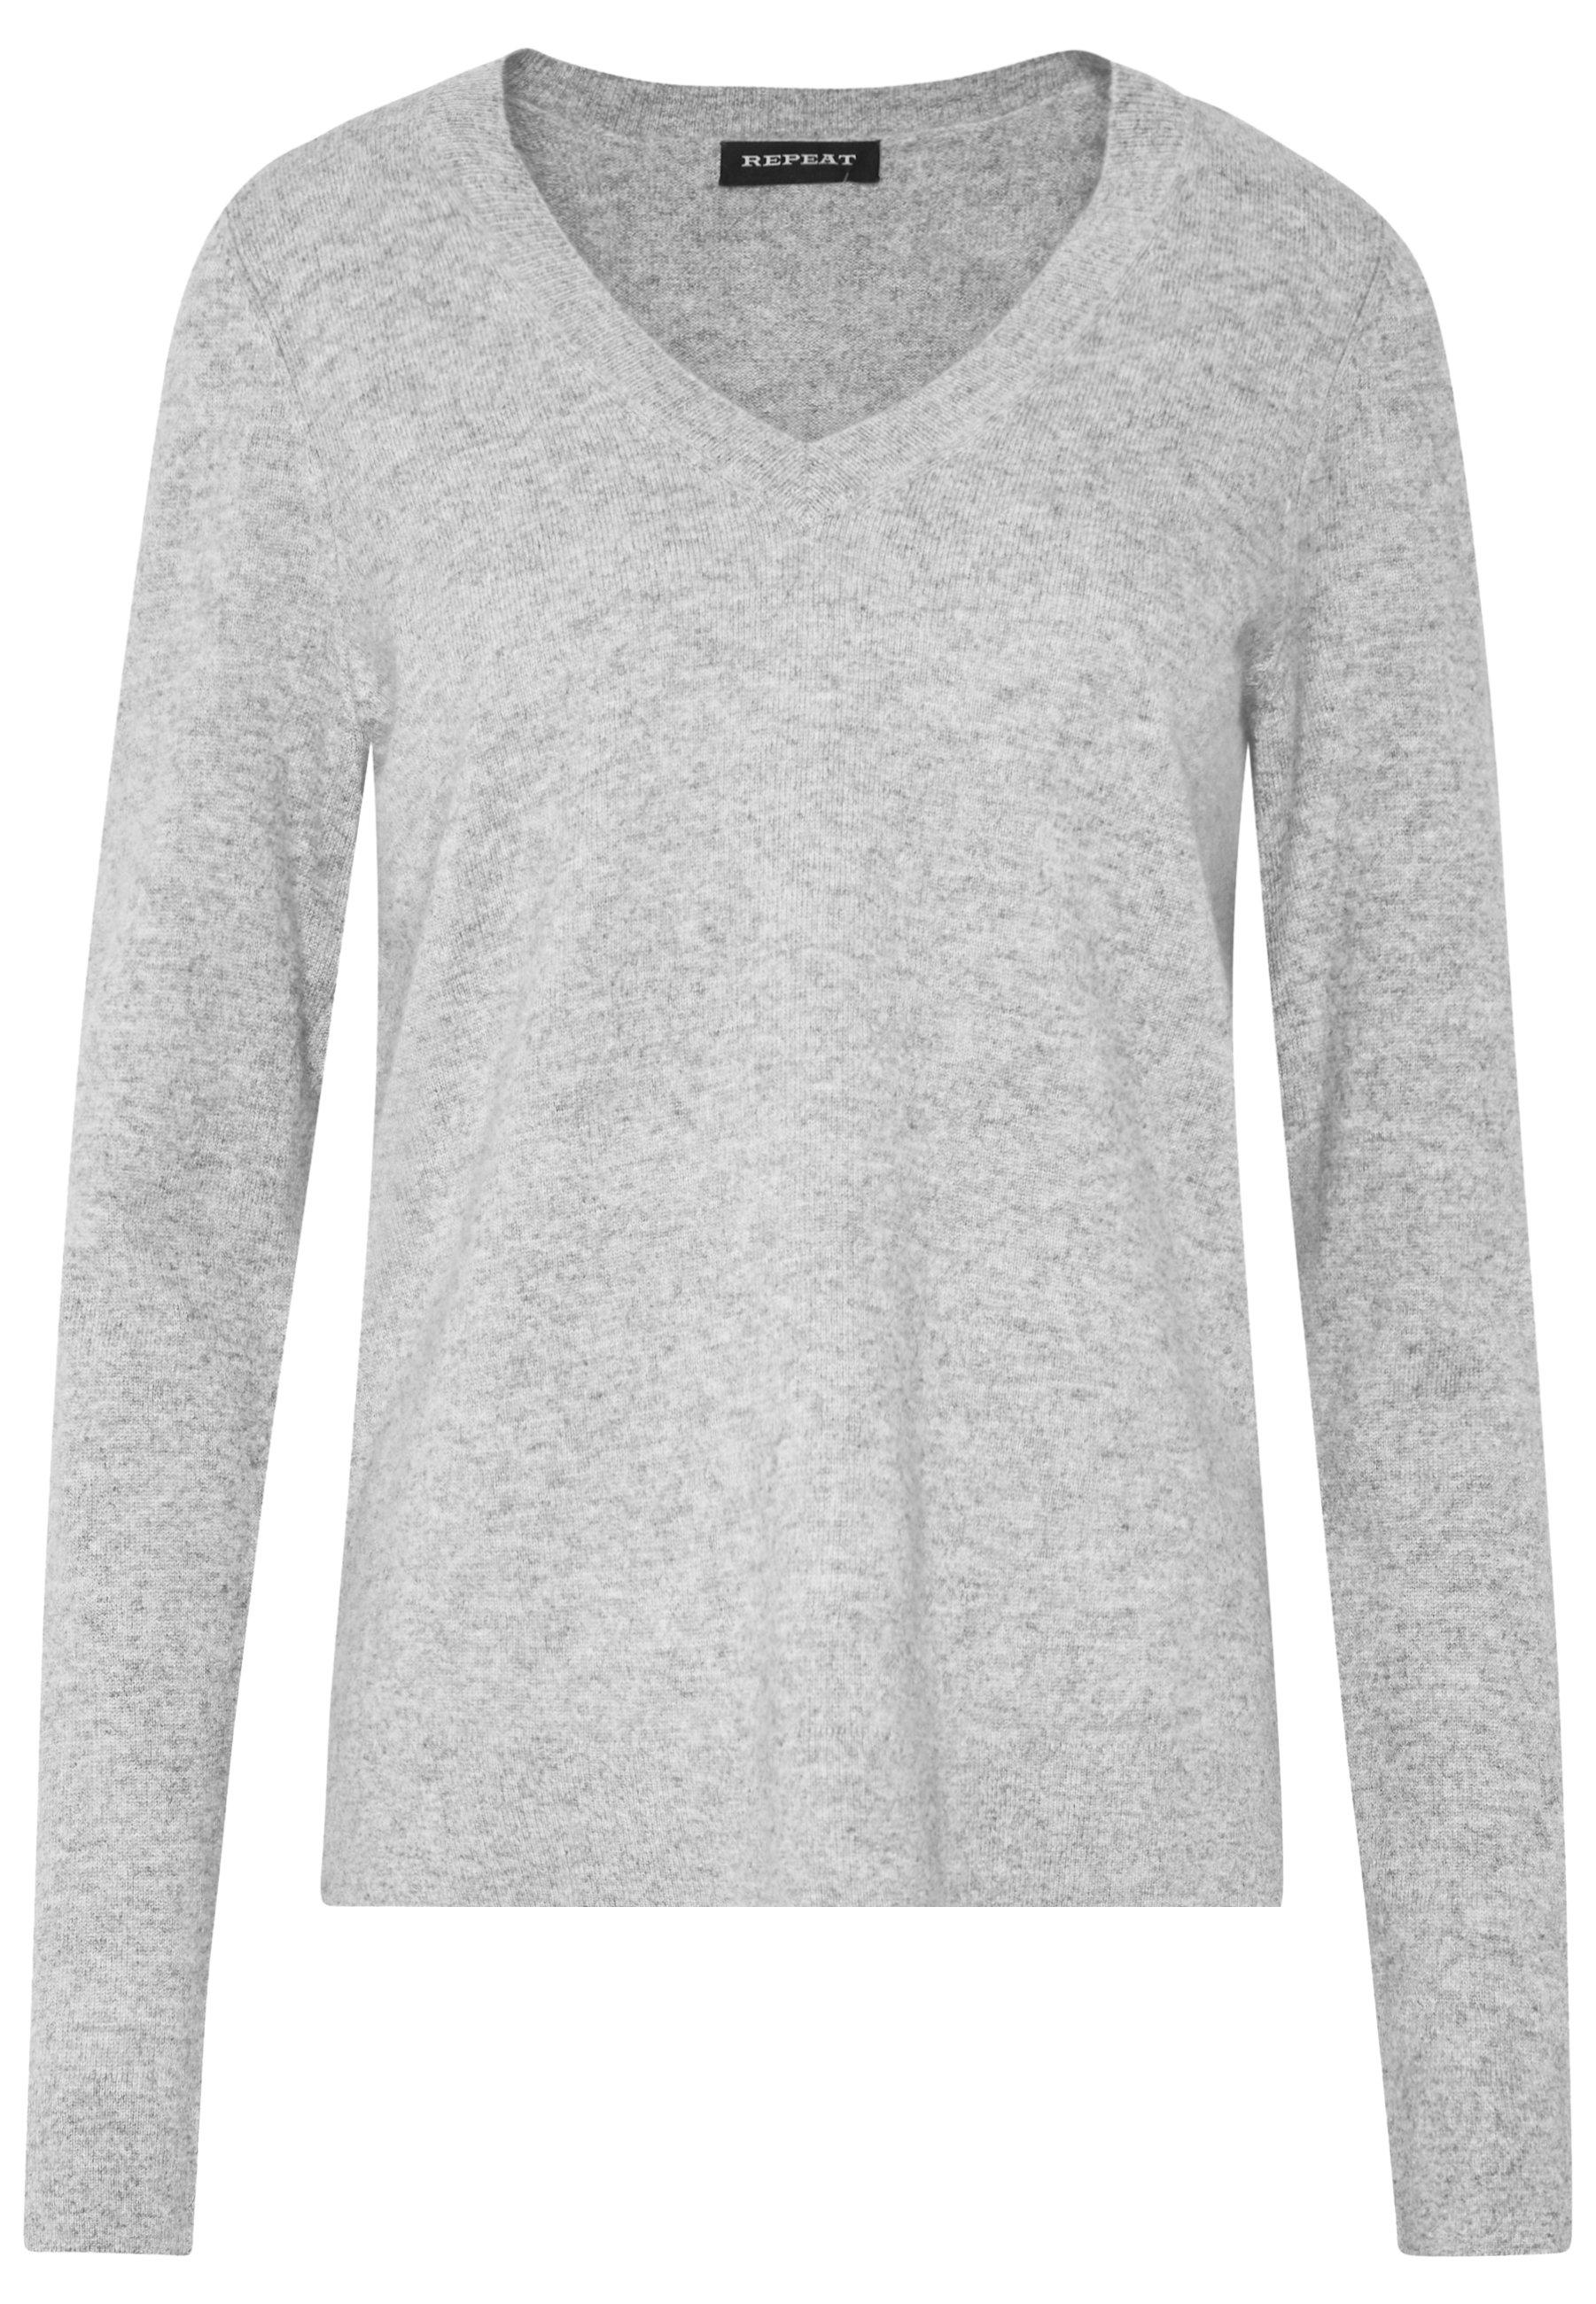 Repeat Sweater - Stickad Tröja Beige